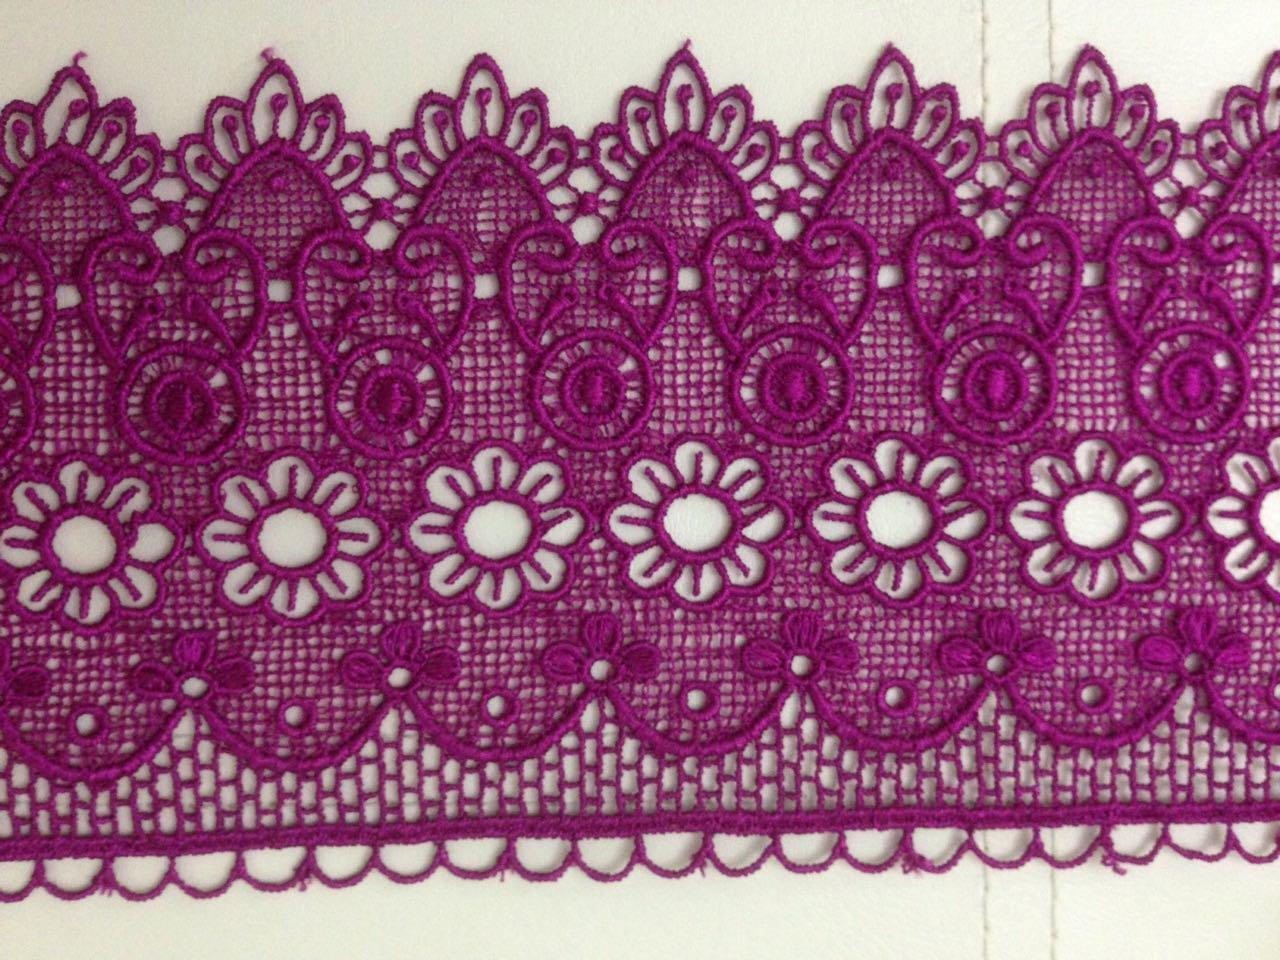 CERISE PINK BEAUTIFUL GUIPURE LACE TRIM EDGING Wedding Border (4'' / 10 CM) 1Yard Mctrimmings